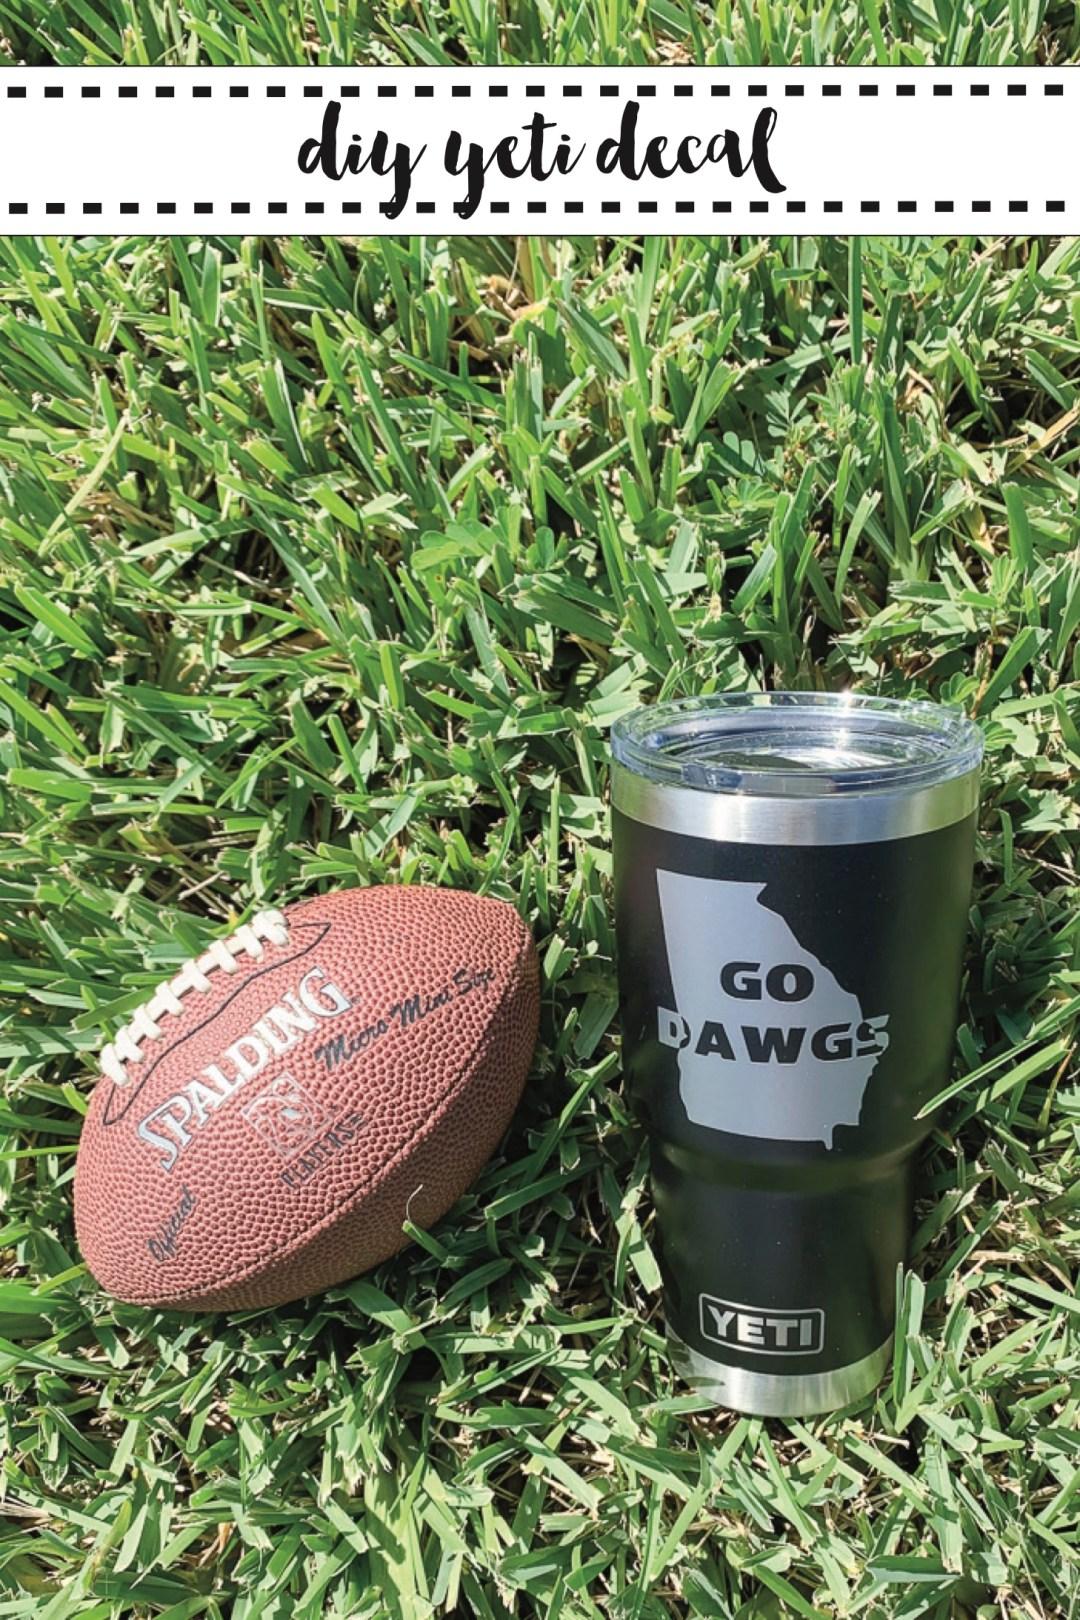 SEC Football Yeti Cup